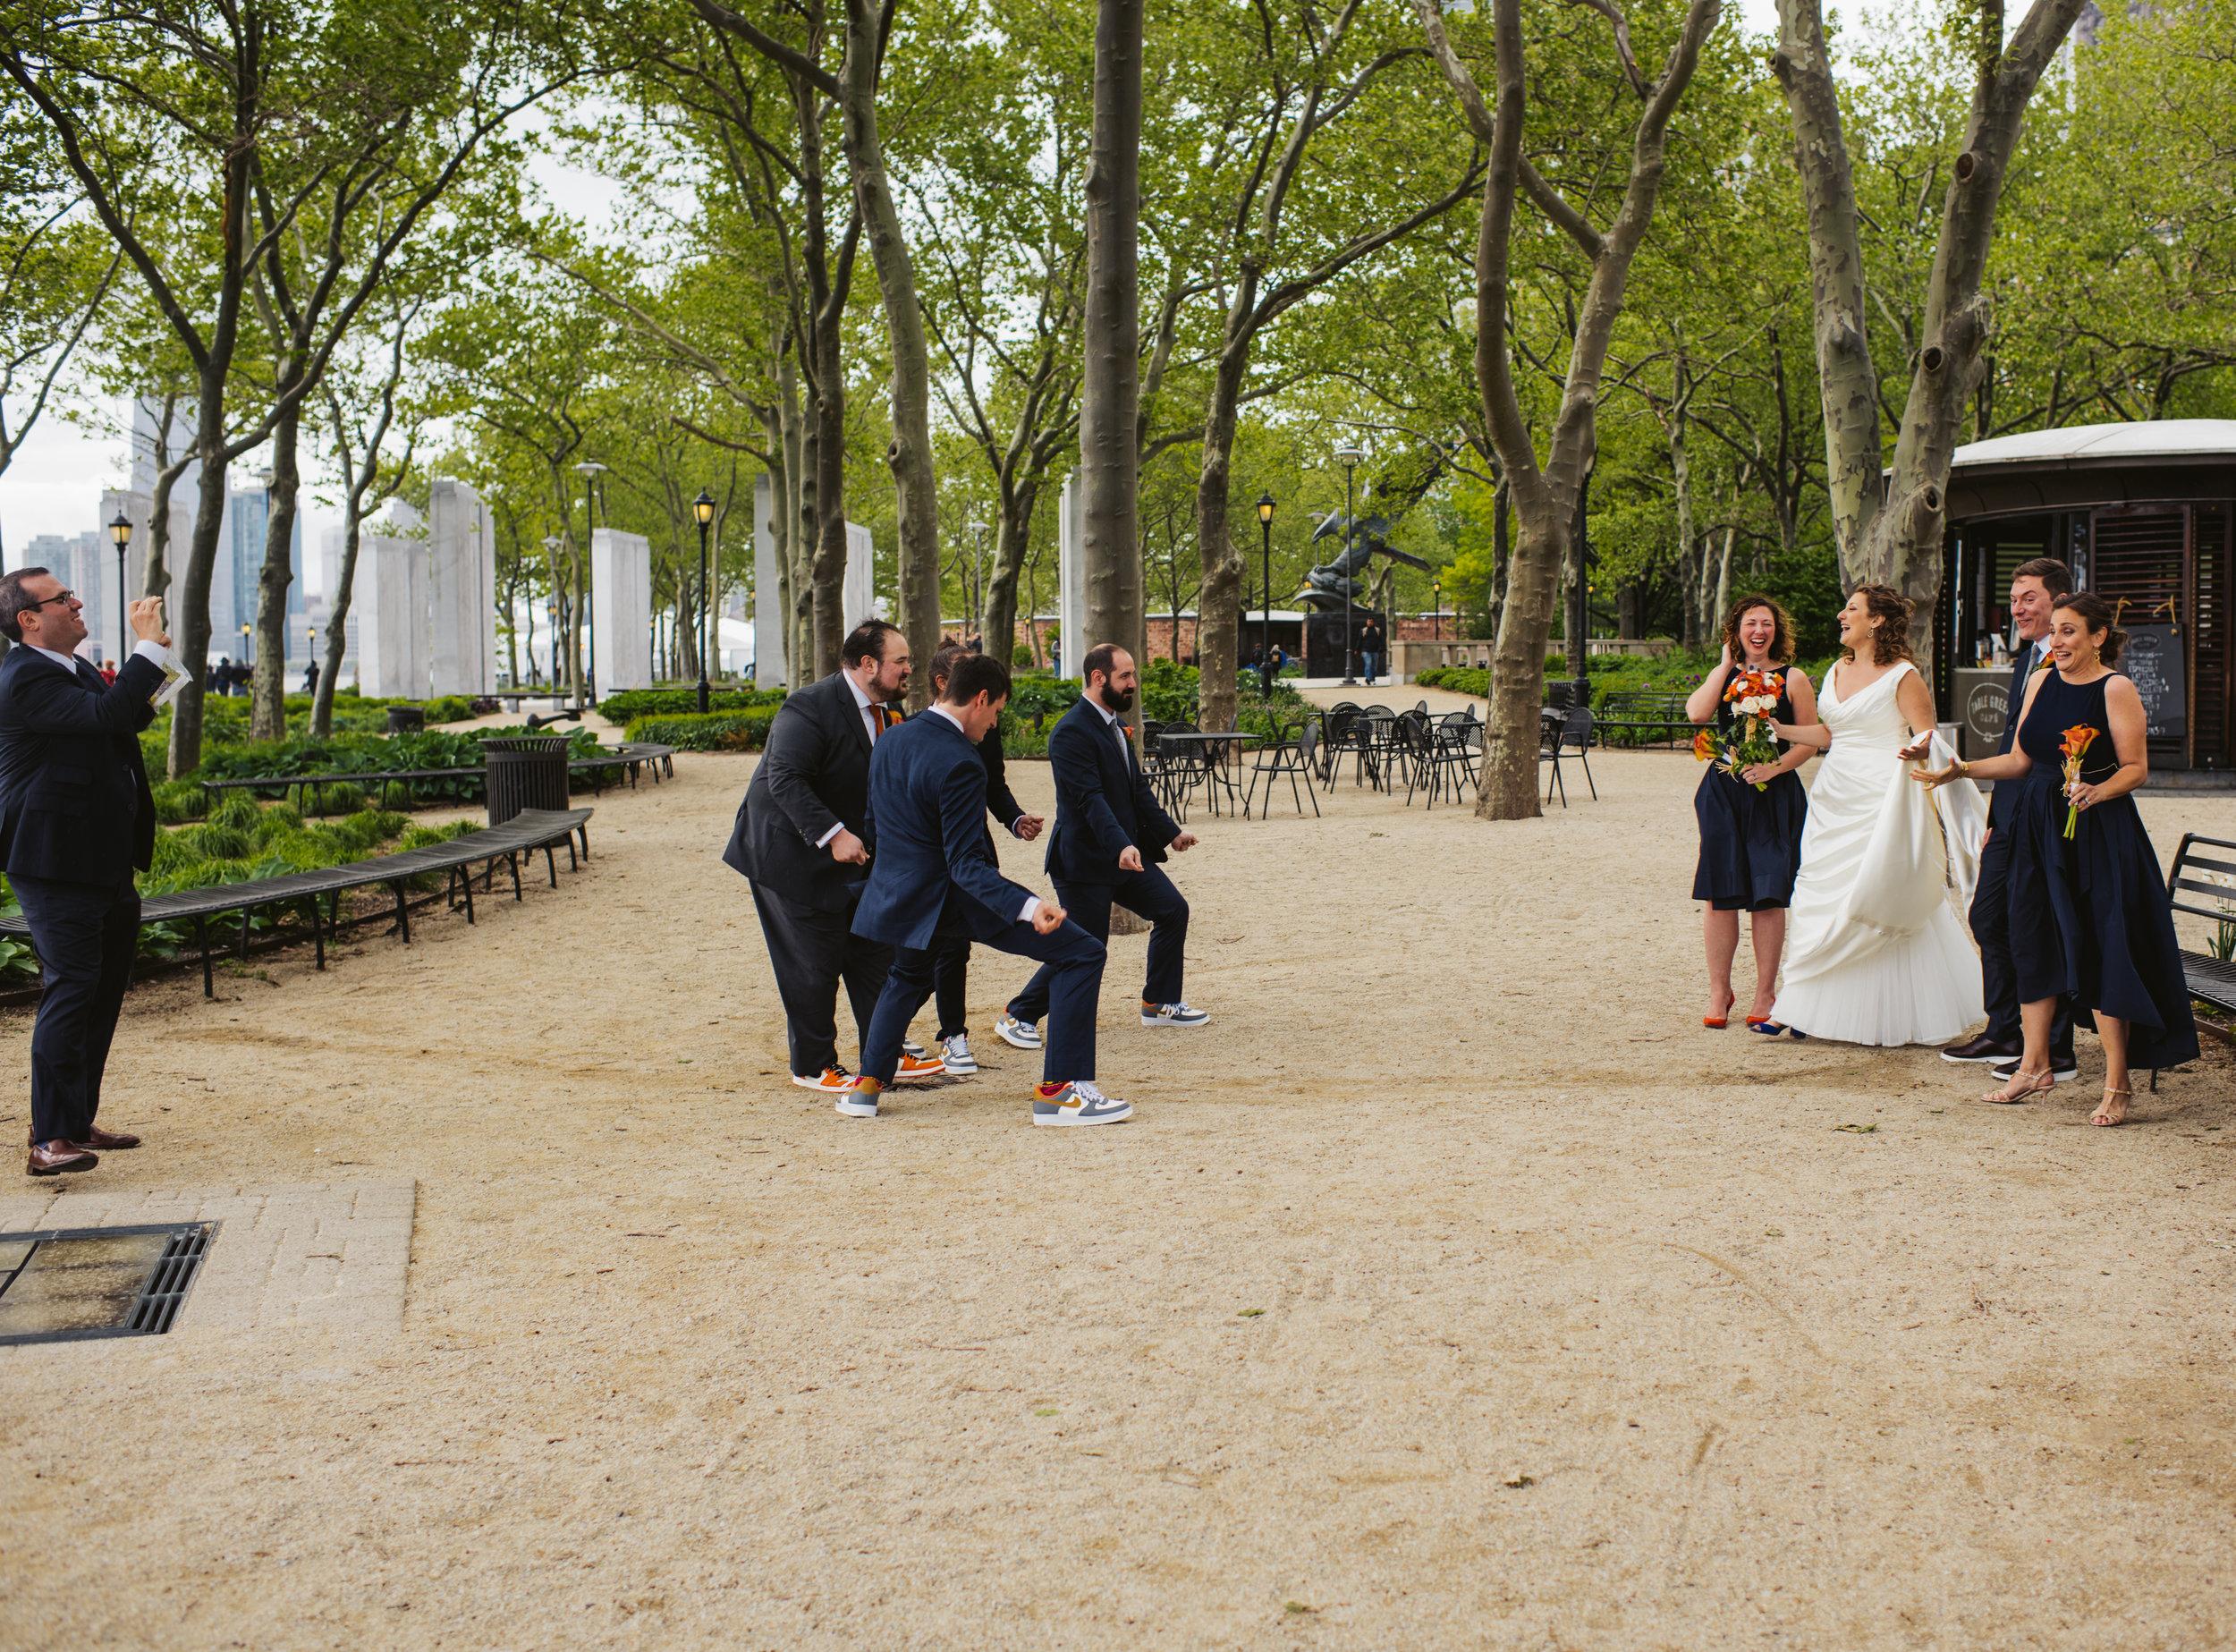 LIZA & JON - BATTERY PARK WEDDING - NYC INTIMATE WEDDING PHOTOGRAPHER - CHI-CHI AGBIM-269.jpg